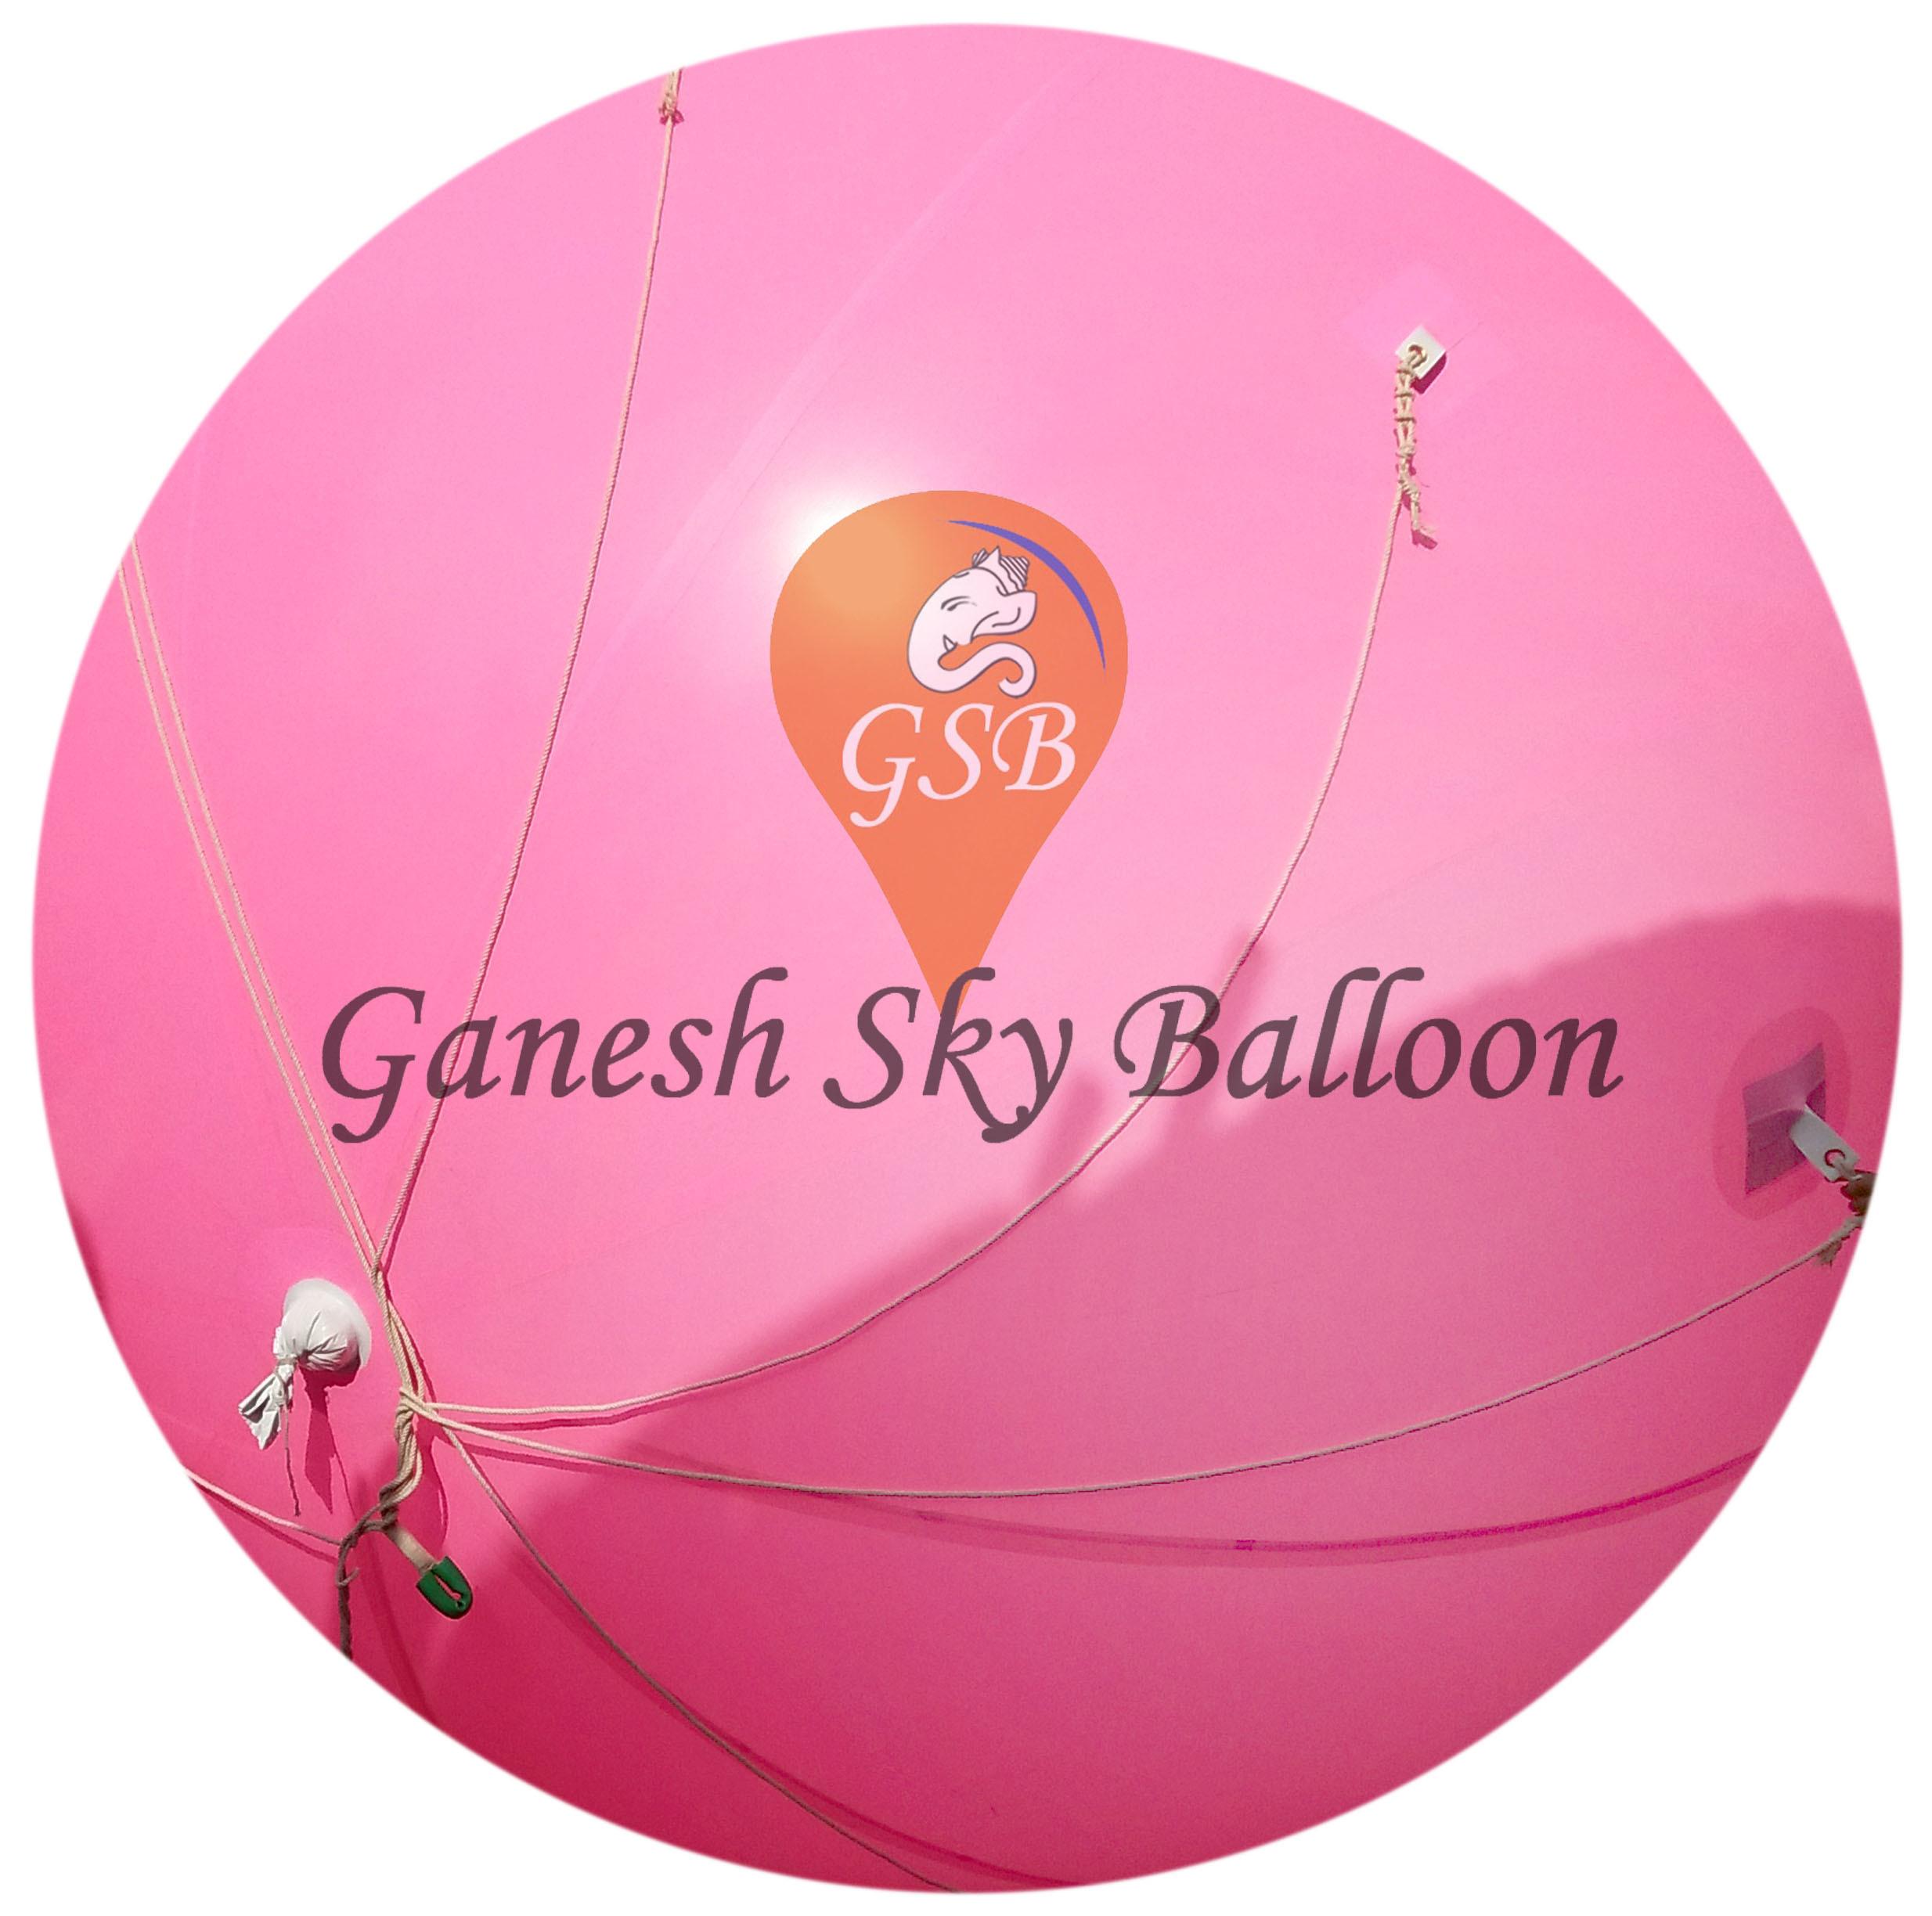 ITI Advertising Sky Balloons